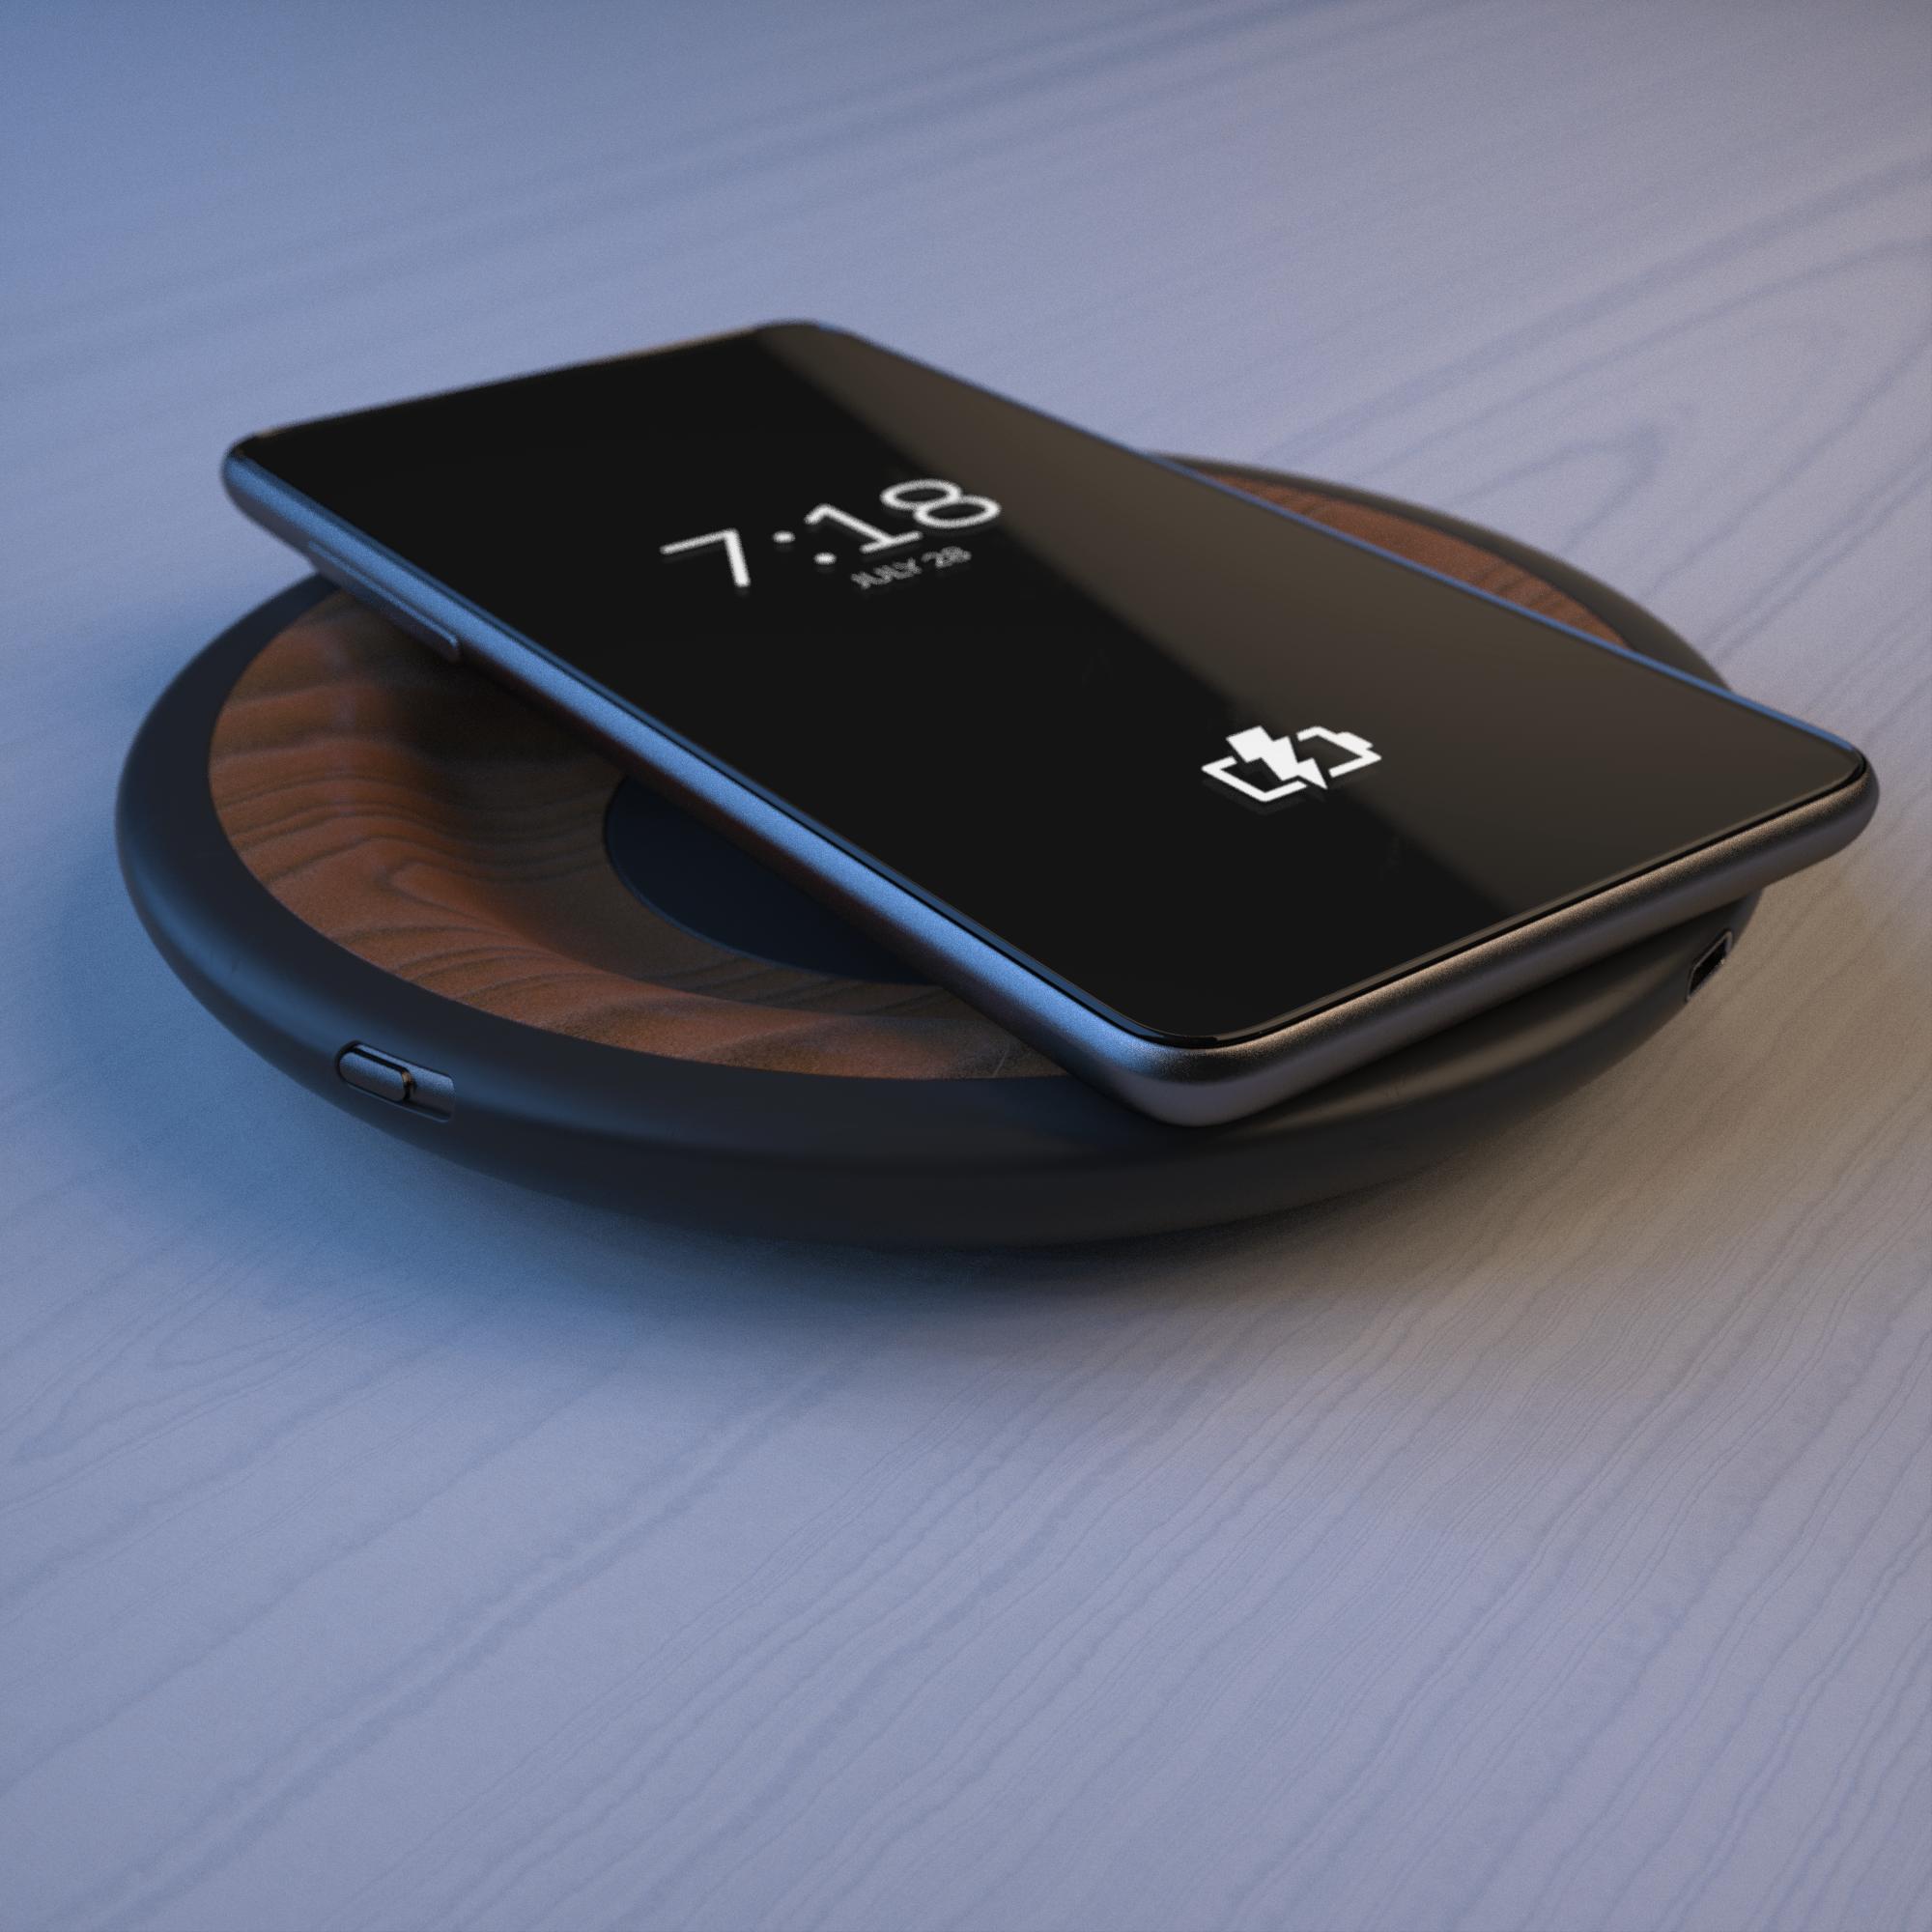 Portable Wireless Powebank